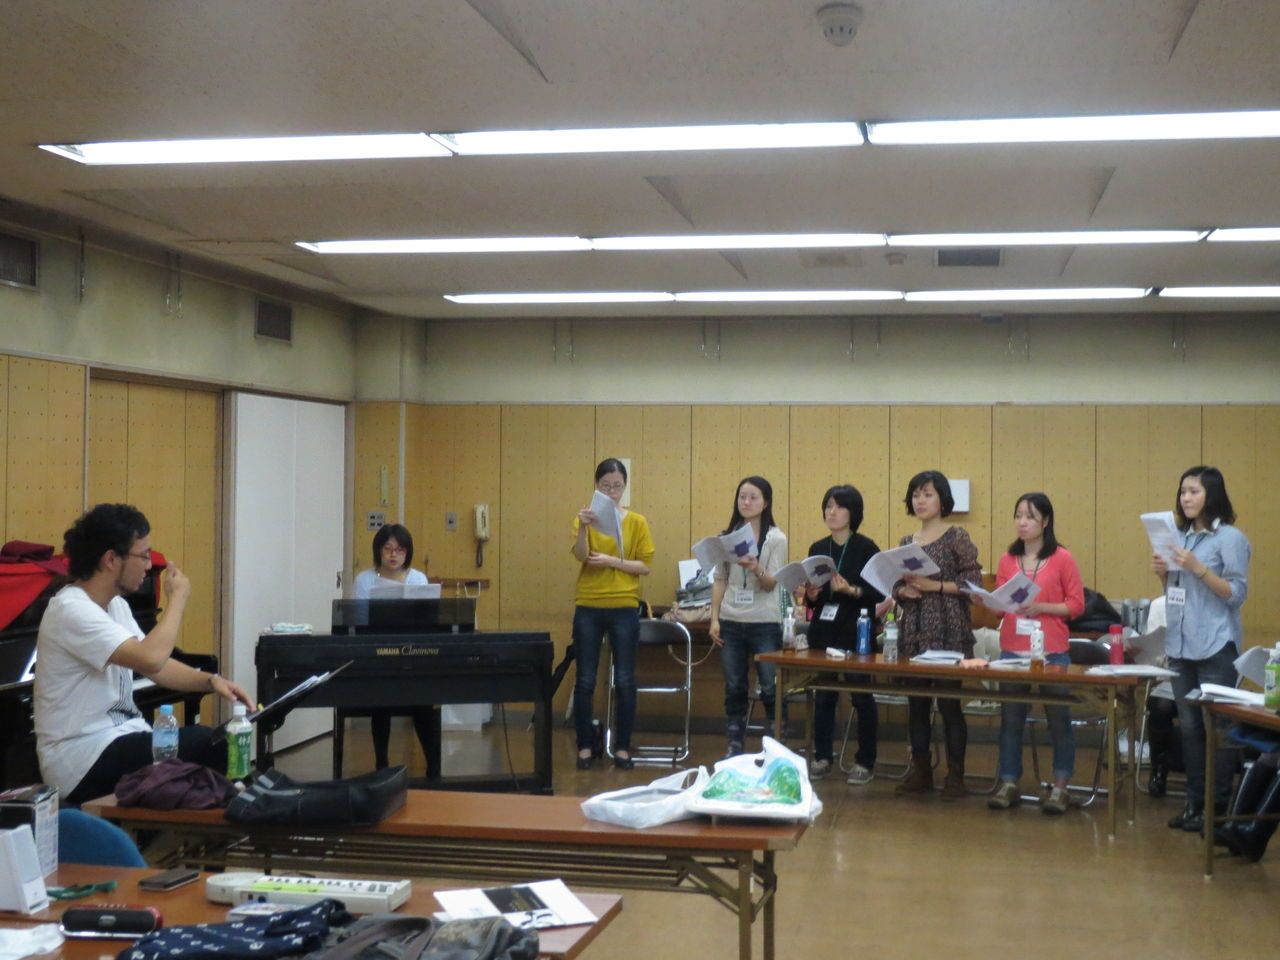 chorus_200131020_009